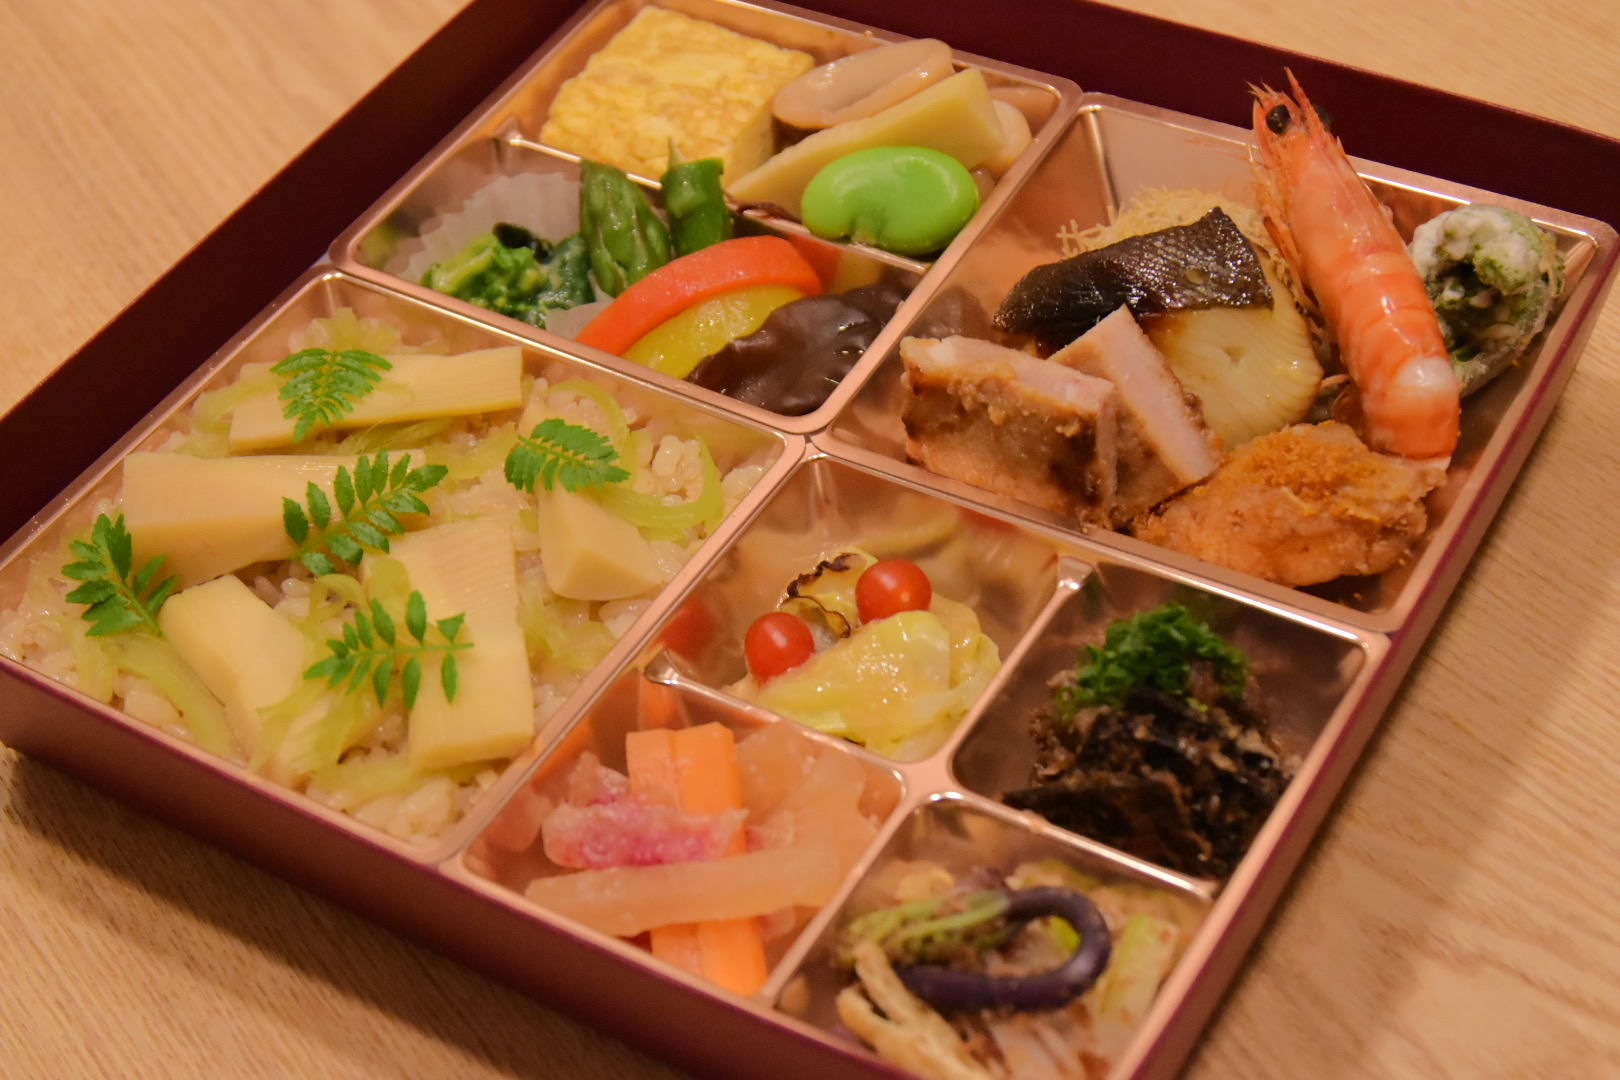 ginza-%e8%b1%89-kuki-ginza-japanese-restaurant-%e9%8a%80%e5%ba%a7%e6%97%a5%e6%9c%ac%e6%96%99%e7%90%864